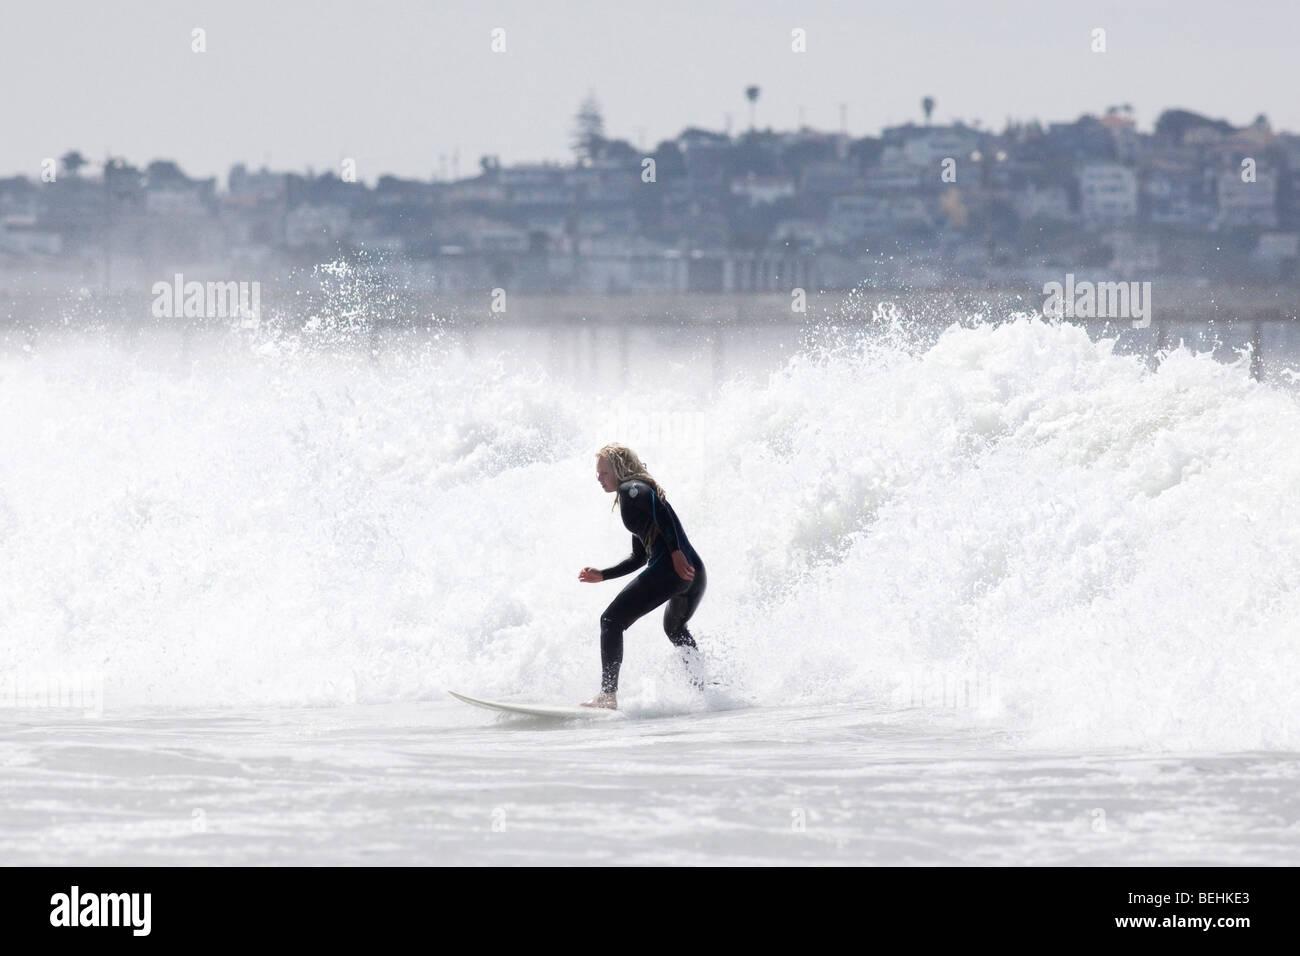 Surfer at Venice Beach, Los Angeles, California, USA - Stock Image